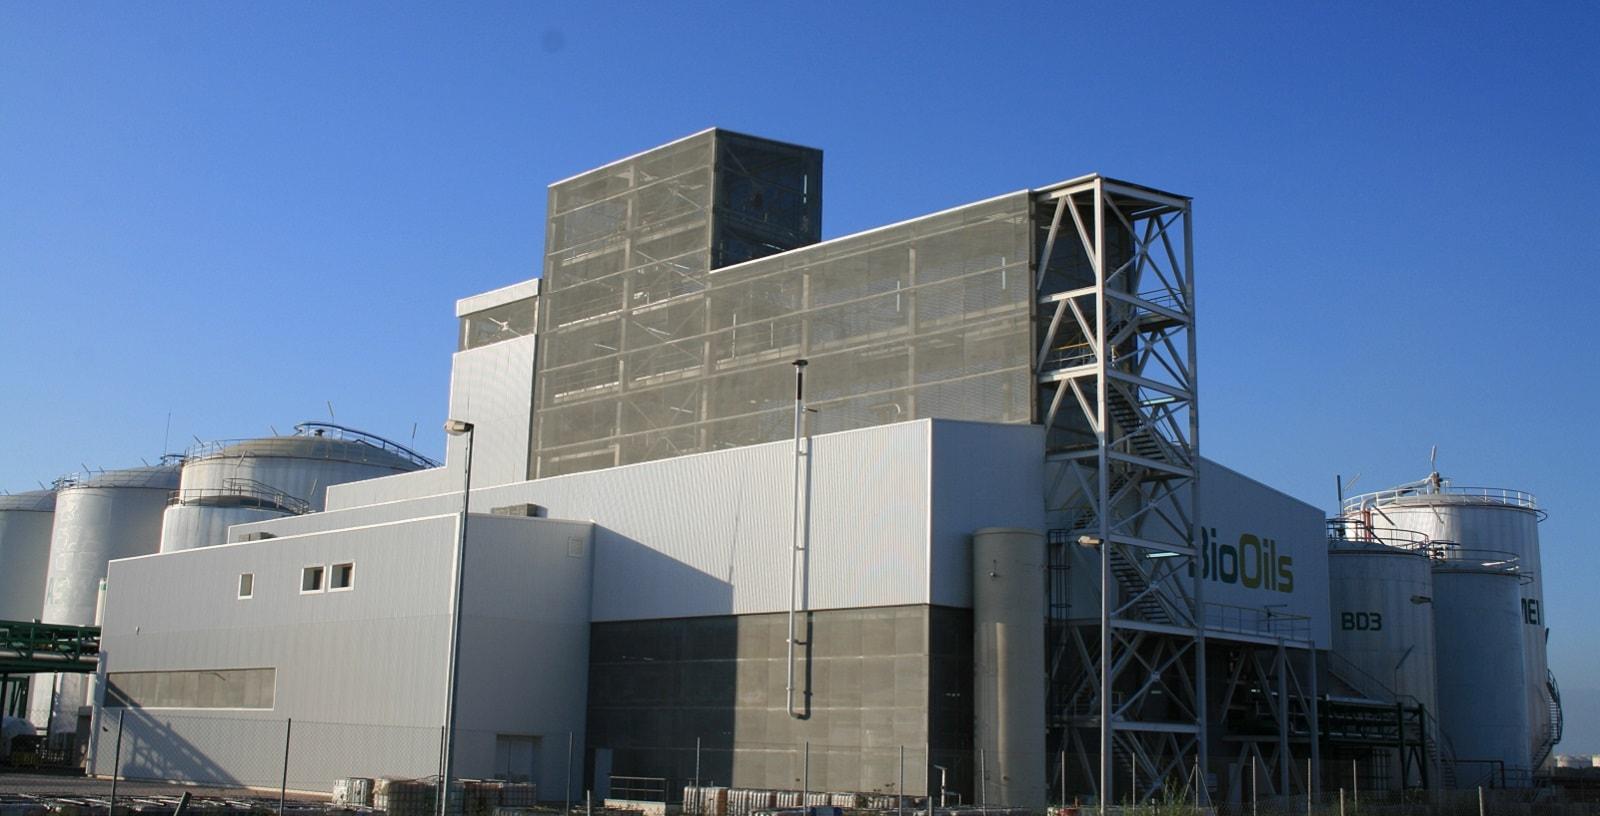 BioOils_Biodiesel_Production_Plant_EPC_IDOM_3